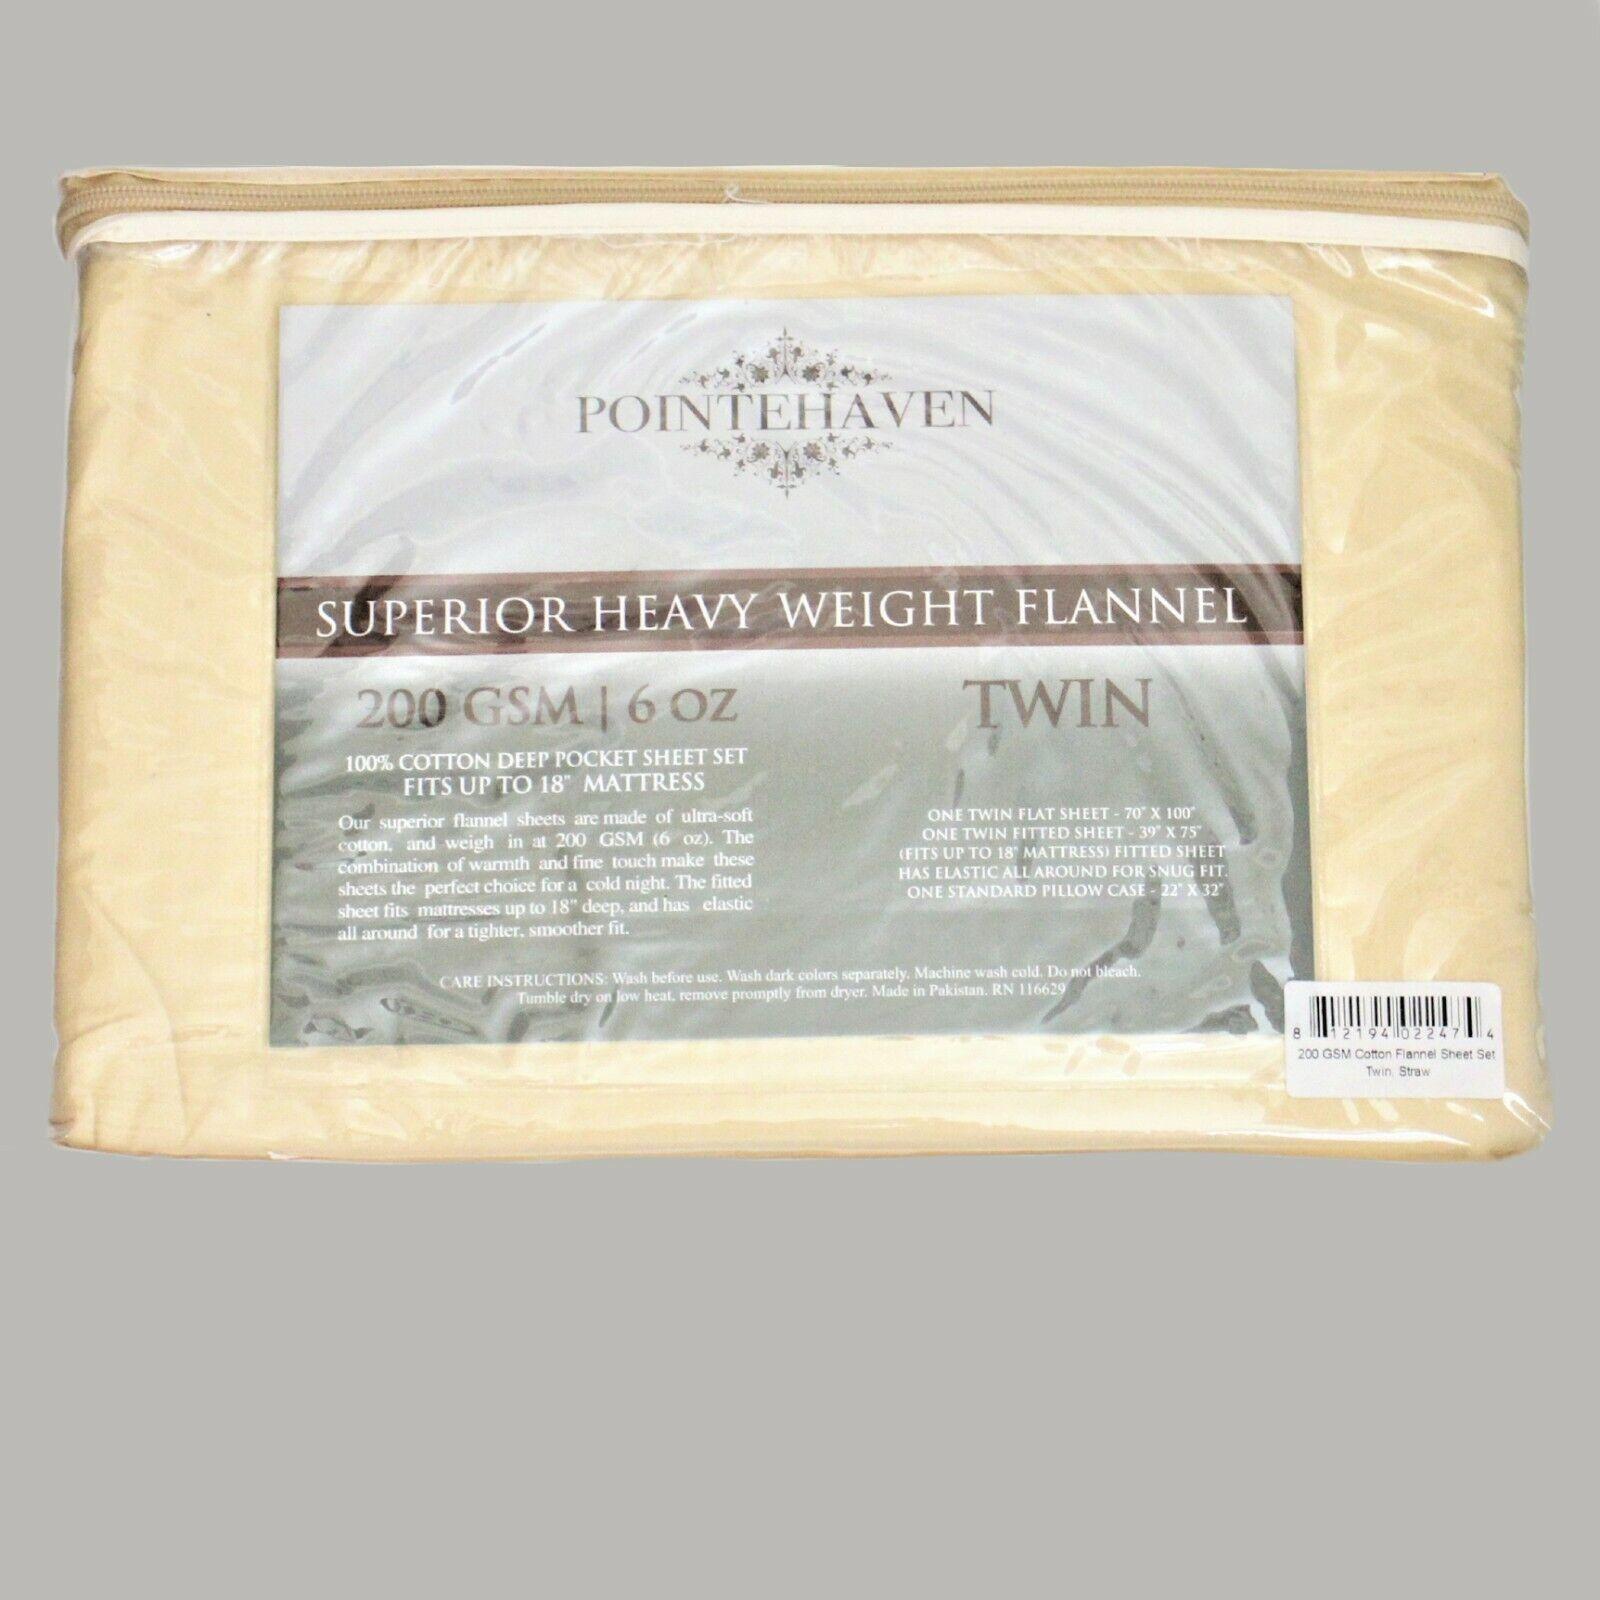 Pointehaven Superior Heavy Weight Flannel Twin Sheet Set Straw 200 Gsm Cotton For Sale Online